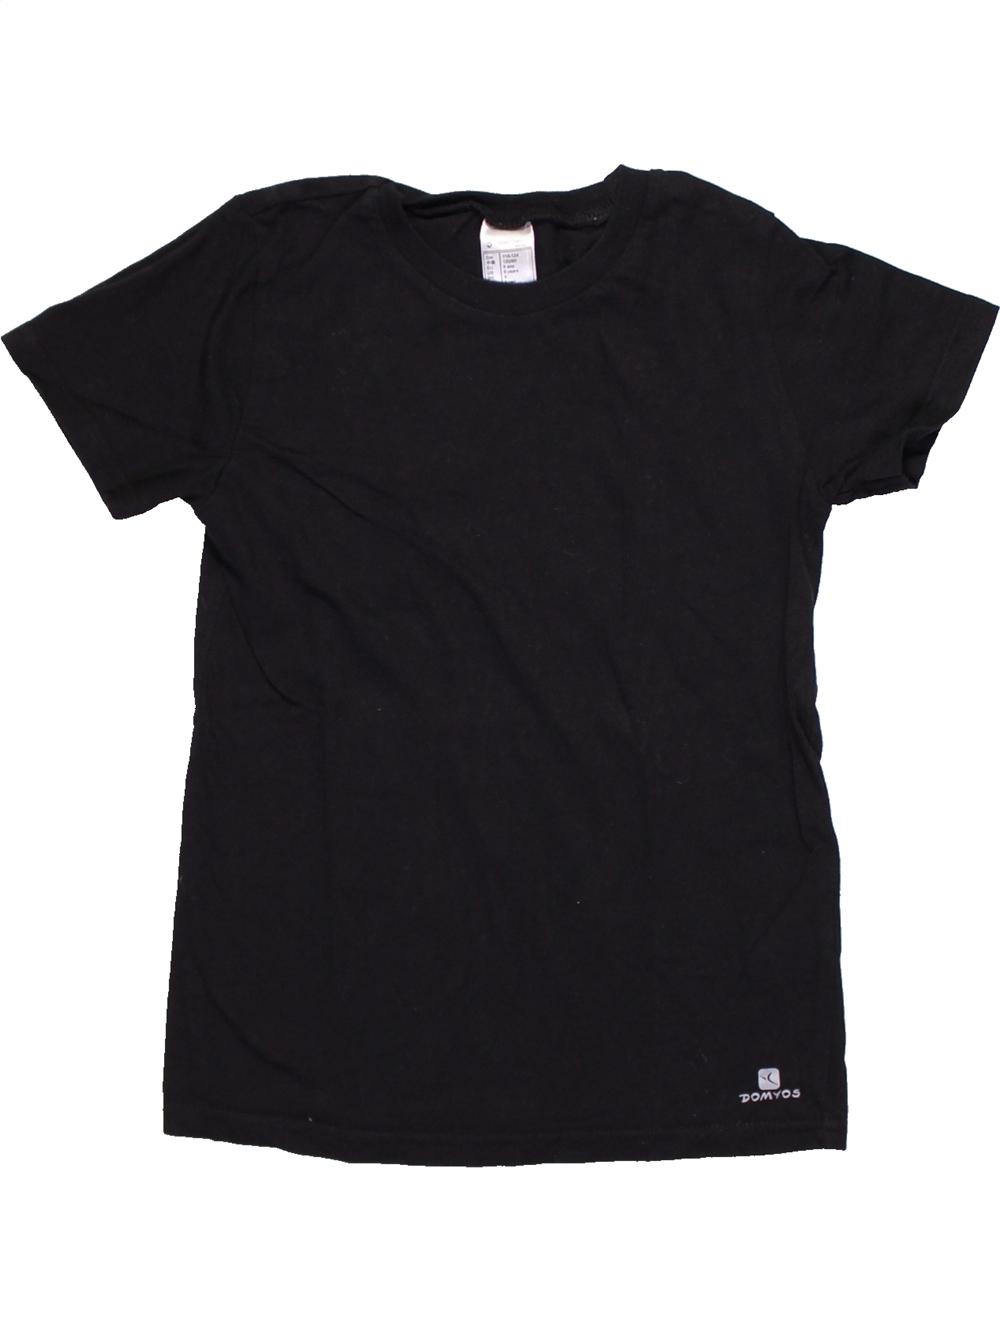 T-shirt-manches-courtes-enfant-garA-on-DOMYOS-6-ans-noir-A-tA-vA-tement-bA-bA